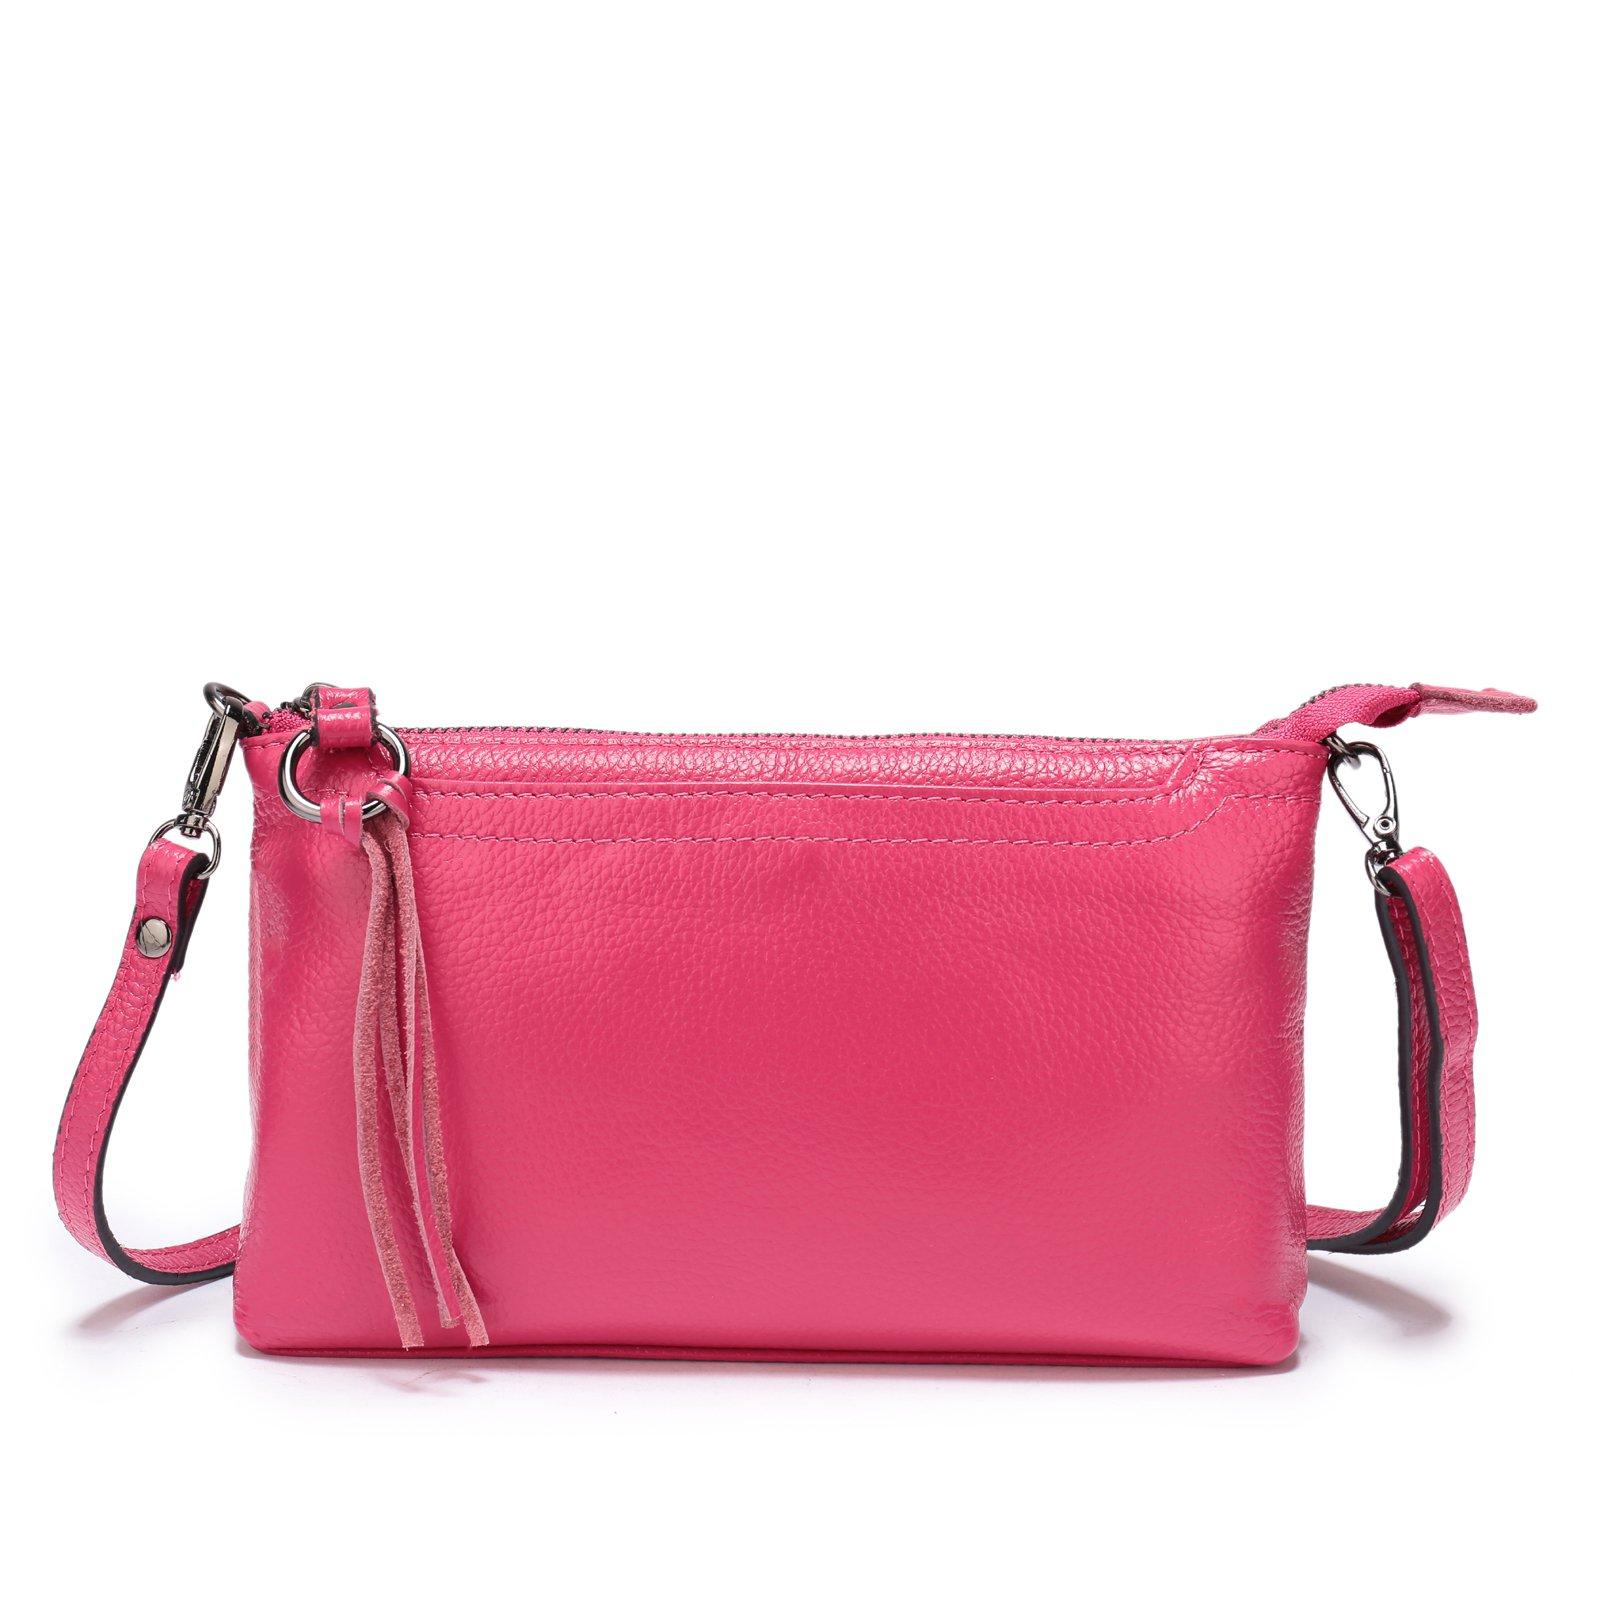 Lanvera Women's Crossbody Shoulder Bag Genuine Leather Zipper Clutch Purse Wallet Handbag (Rose Red)